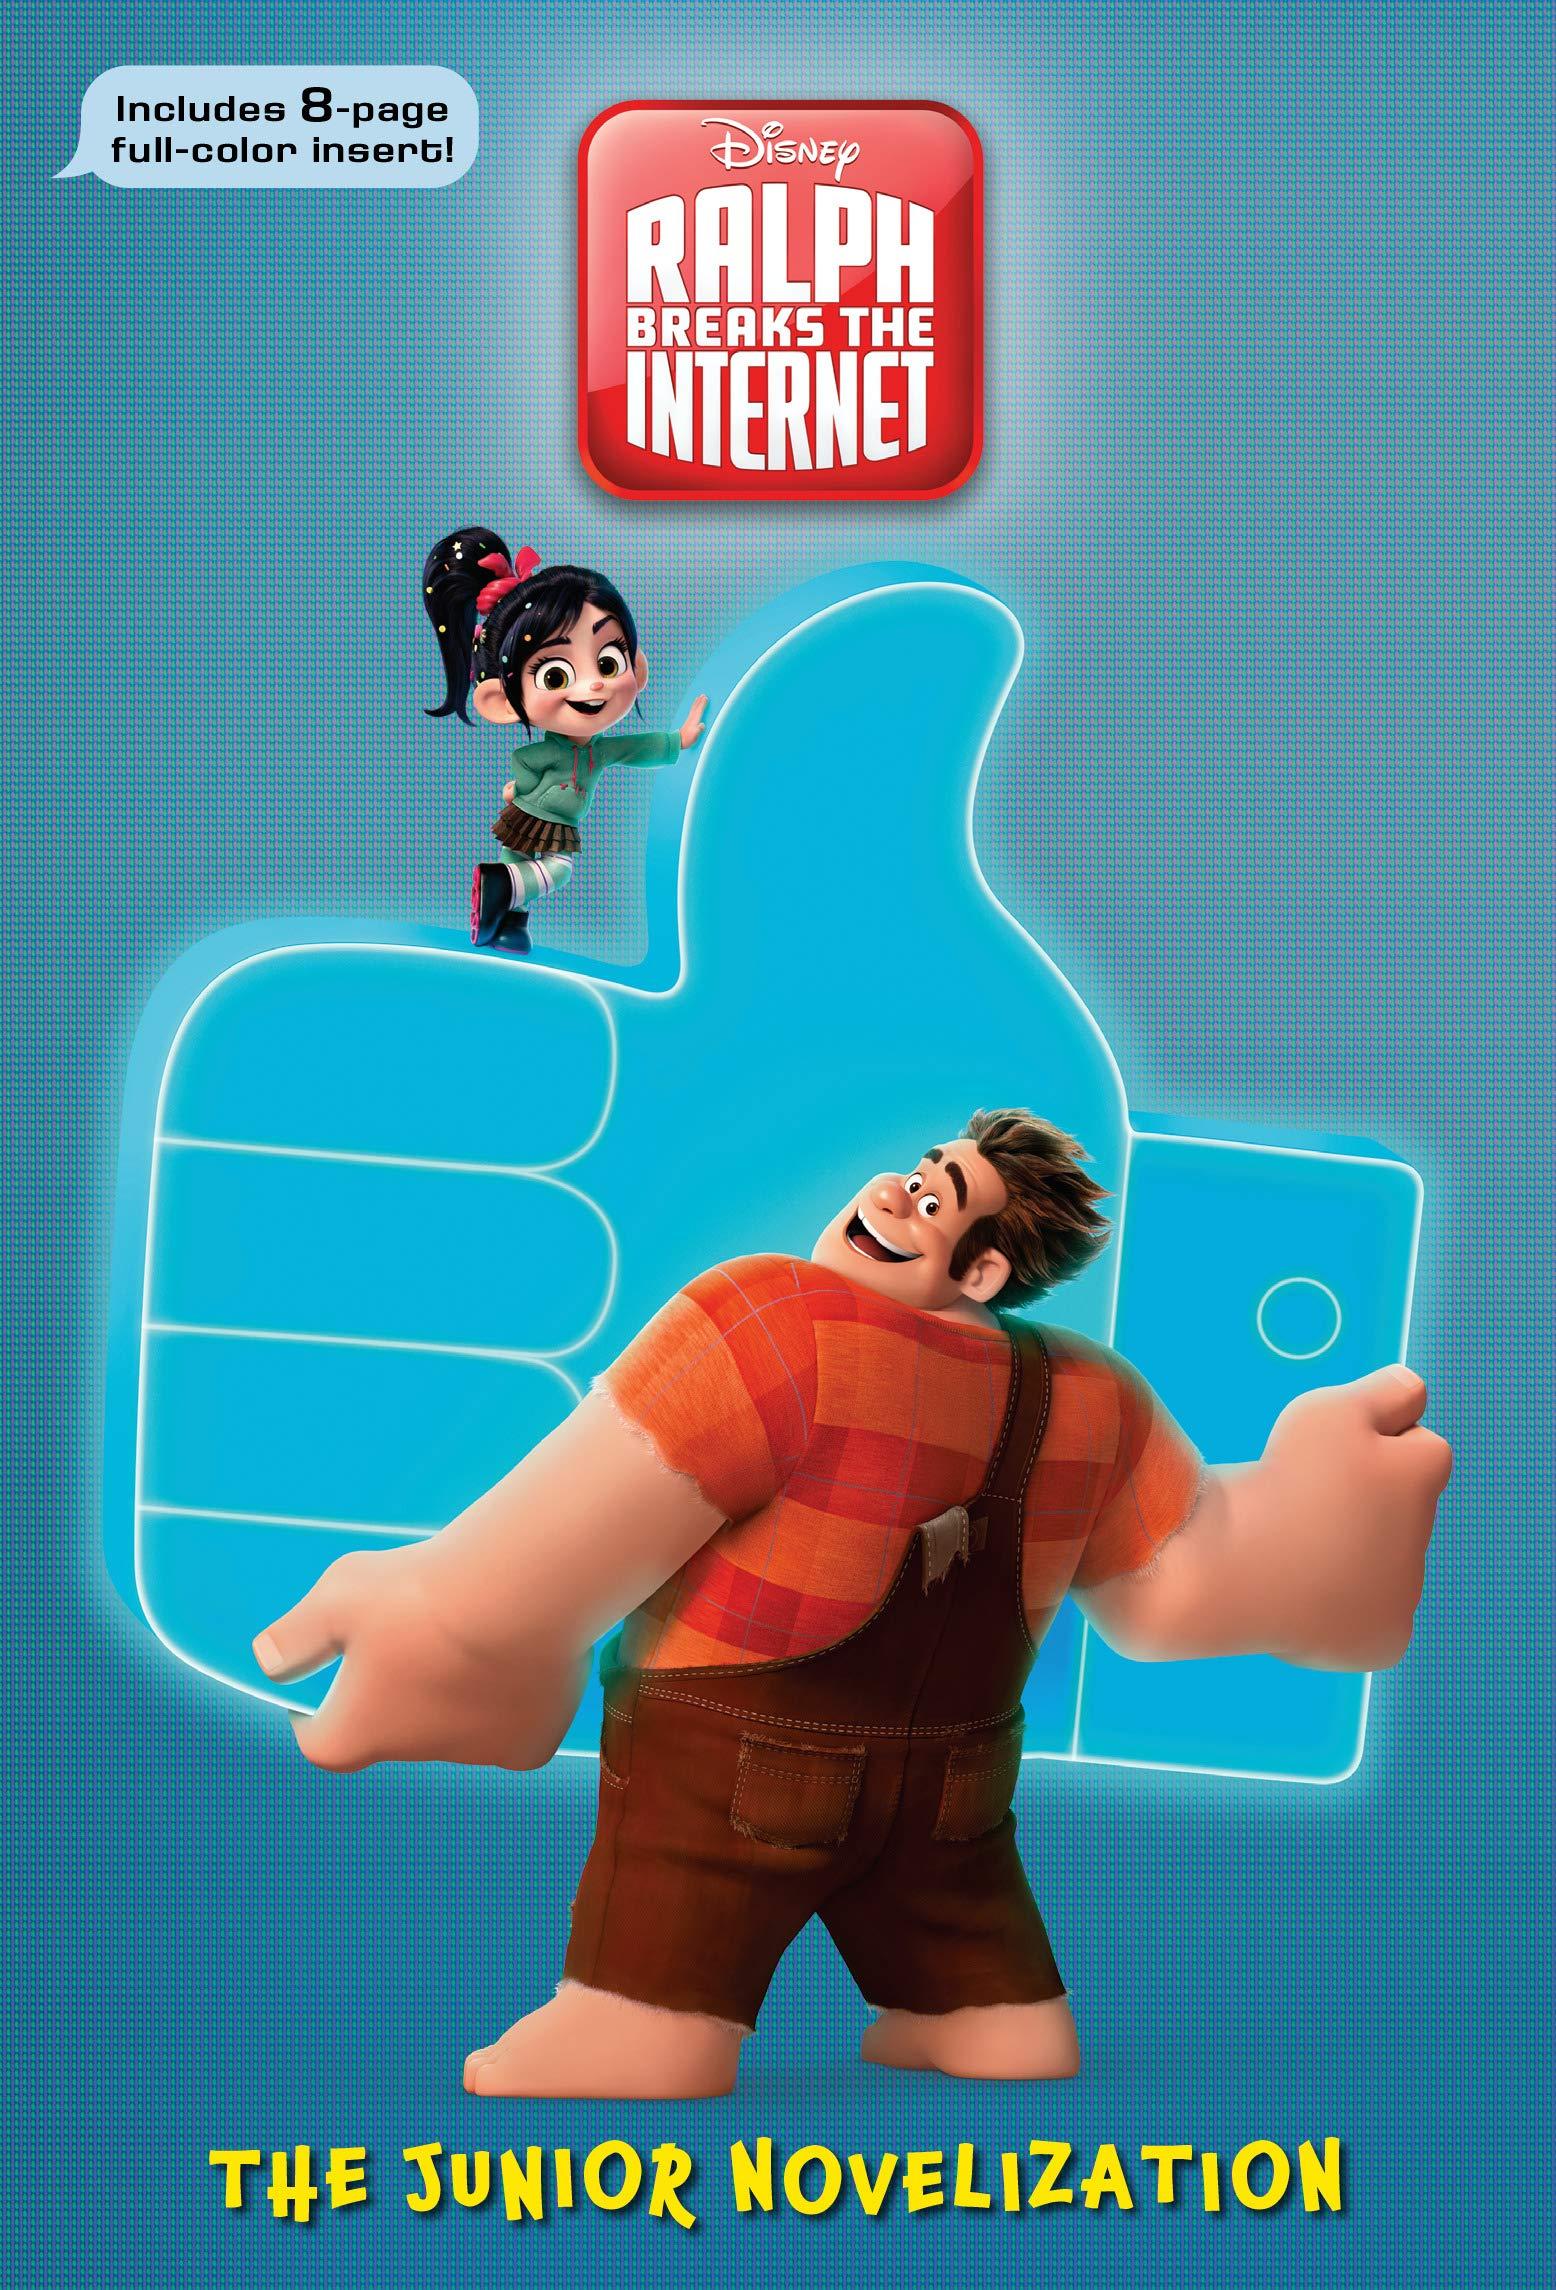 Ralph Breaks The Internet The Junior Novelization Disney Wreck It Ralph 2 Rh Disney Rh Disney 9780736437639 Amazon Com Books